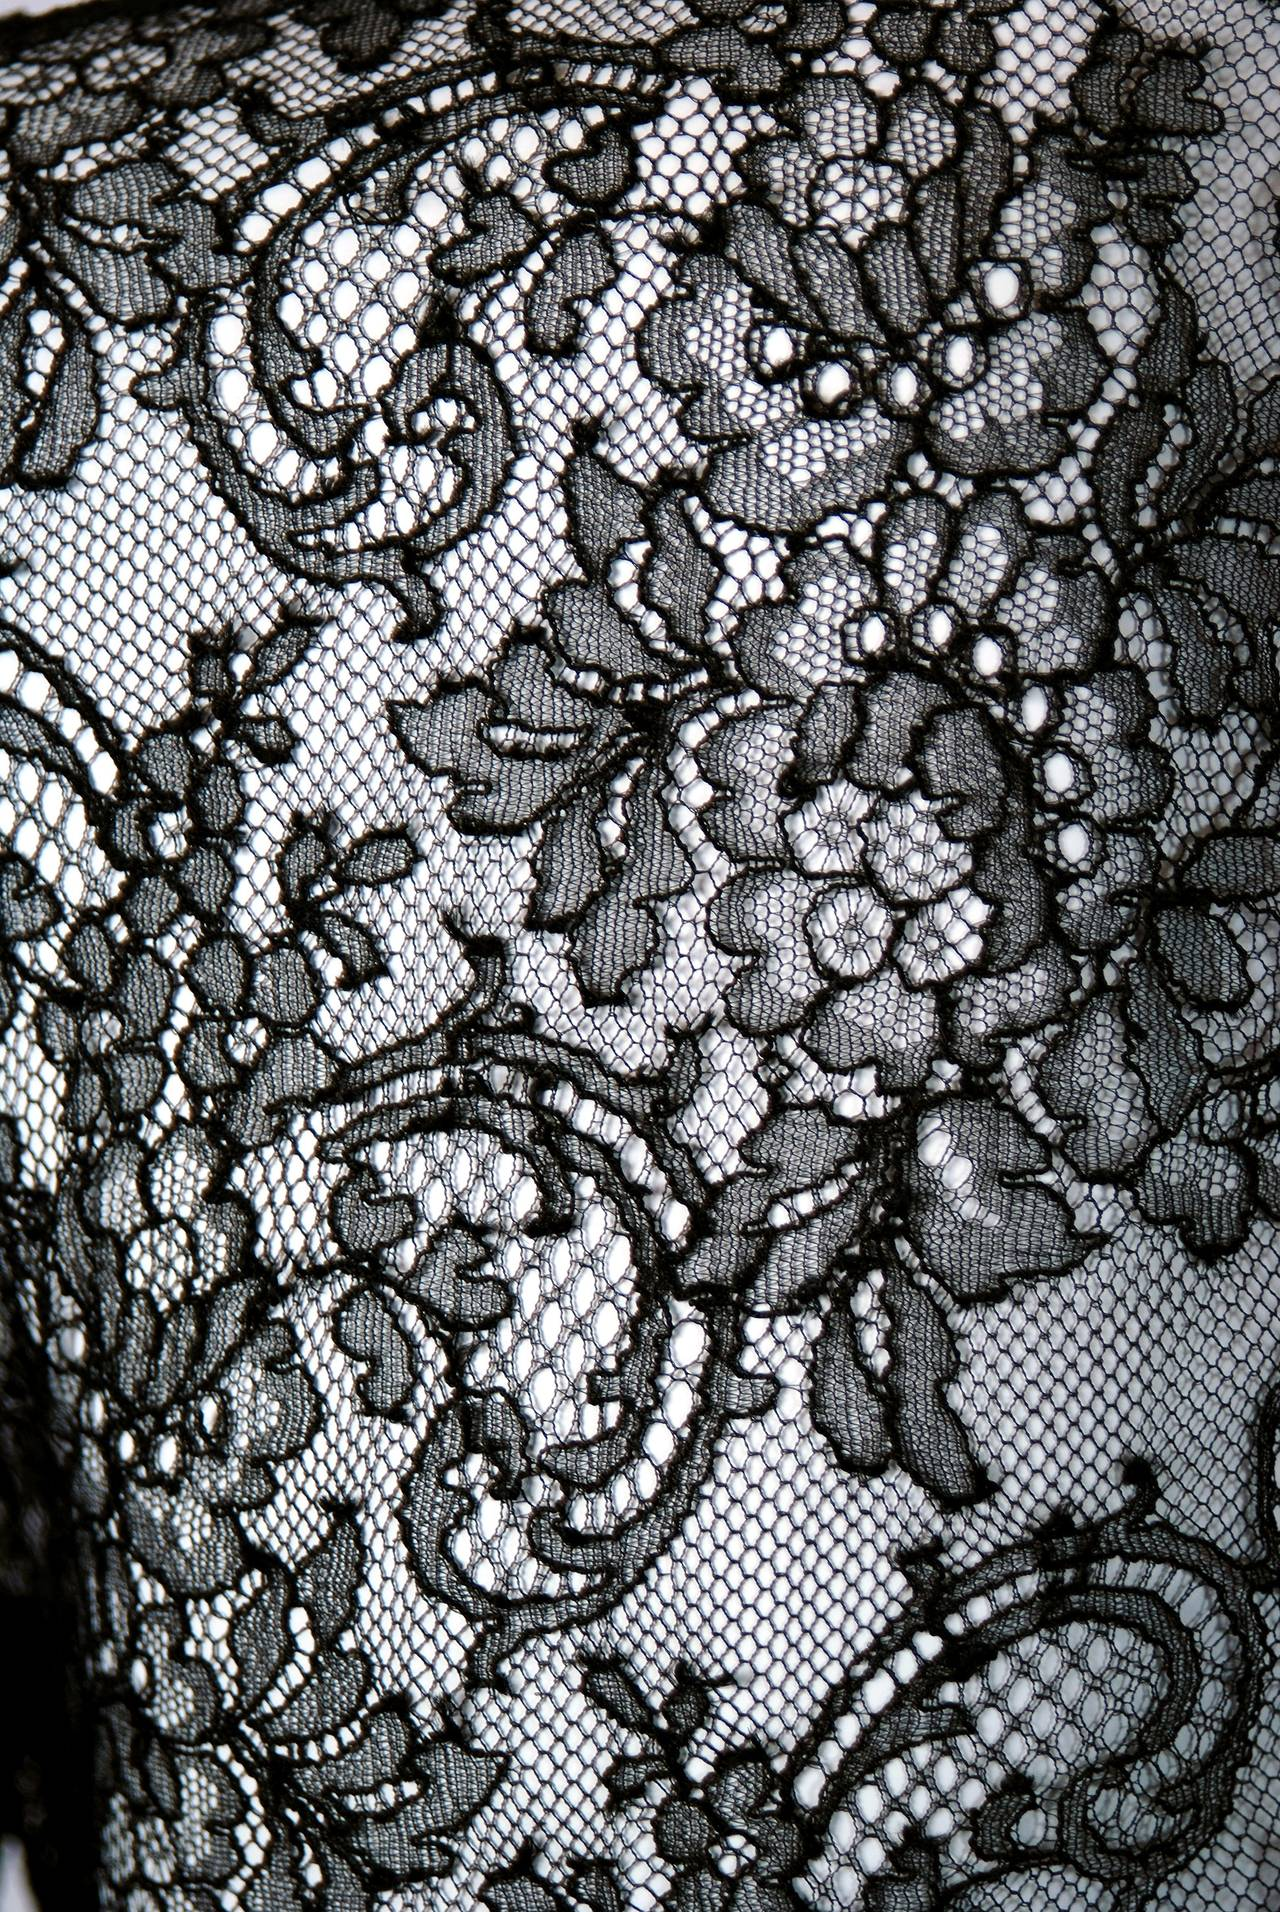 1990's Oscar de la Renta Black Lace Illusion & Mocha Silk-Chiffon Sculpted Dress In Excellent Condition For Sale In Beverly Hills, CA